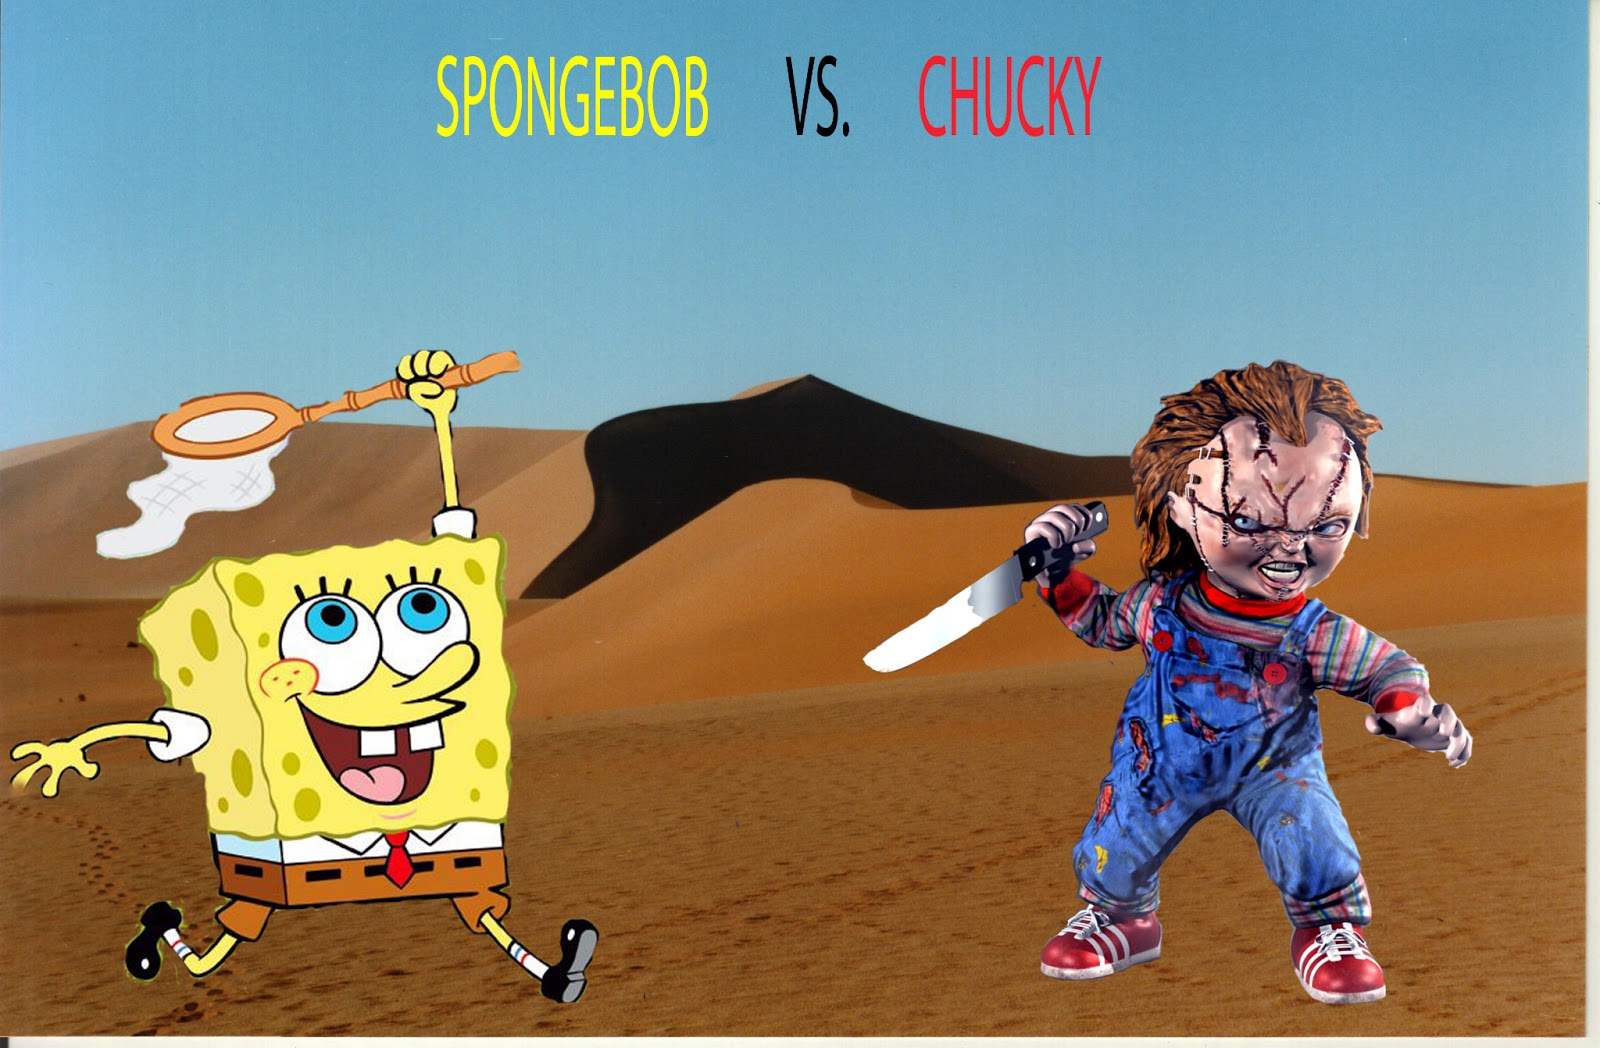 chase pothier's awesome designs: SPONGEBOB VS. CHUCKY